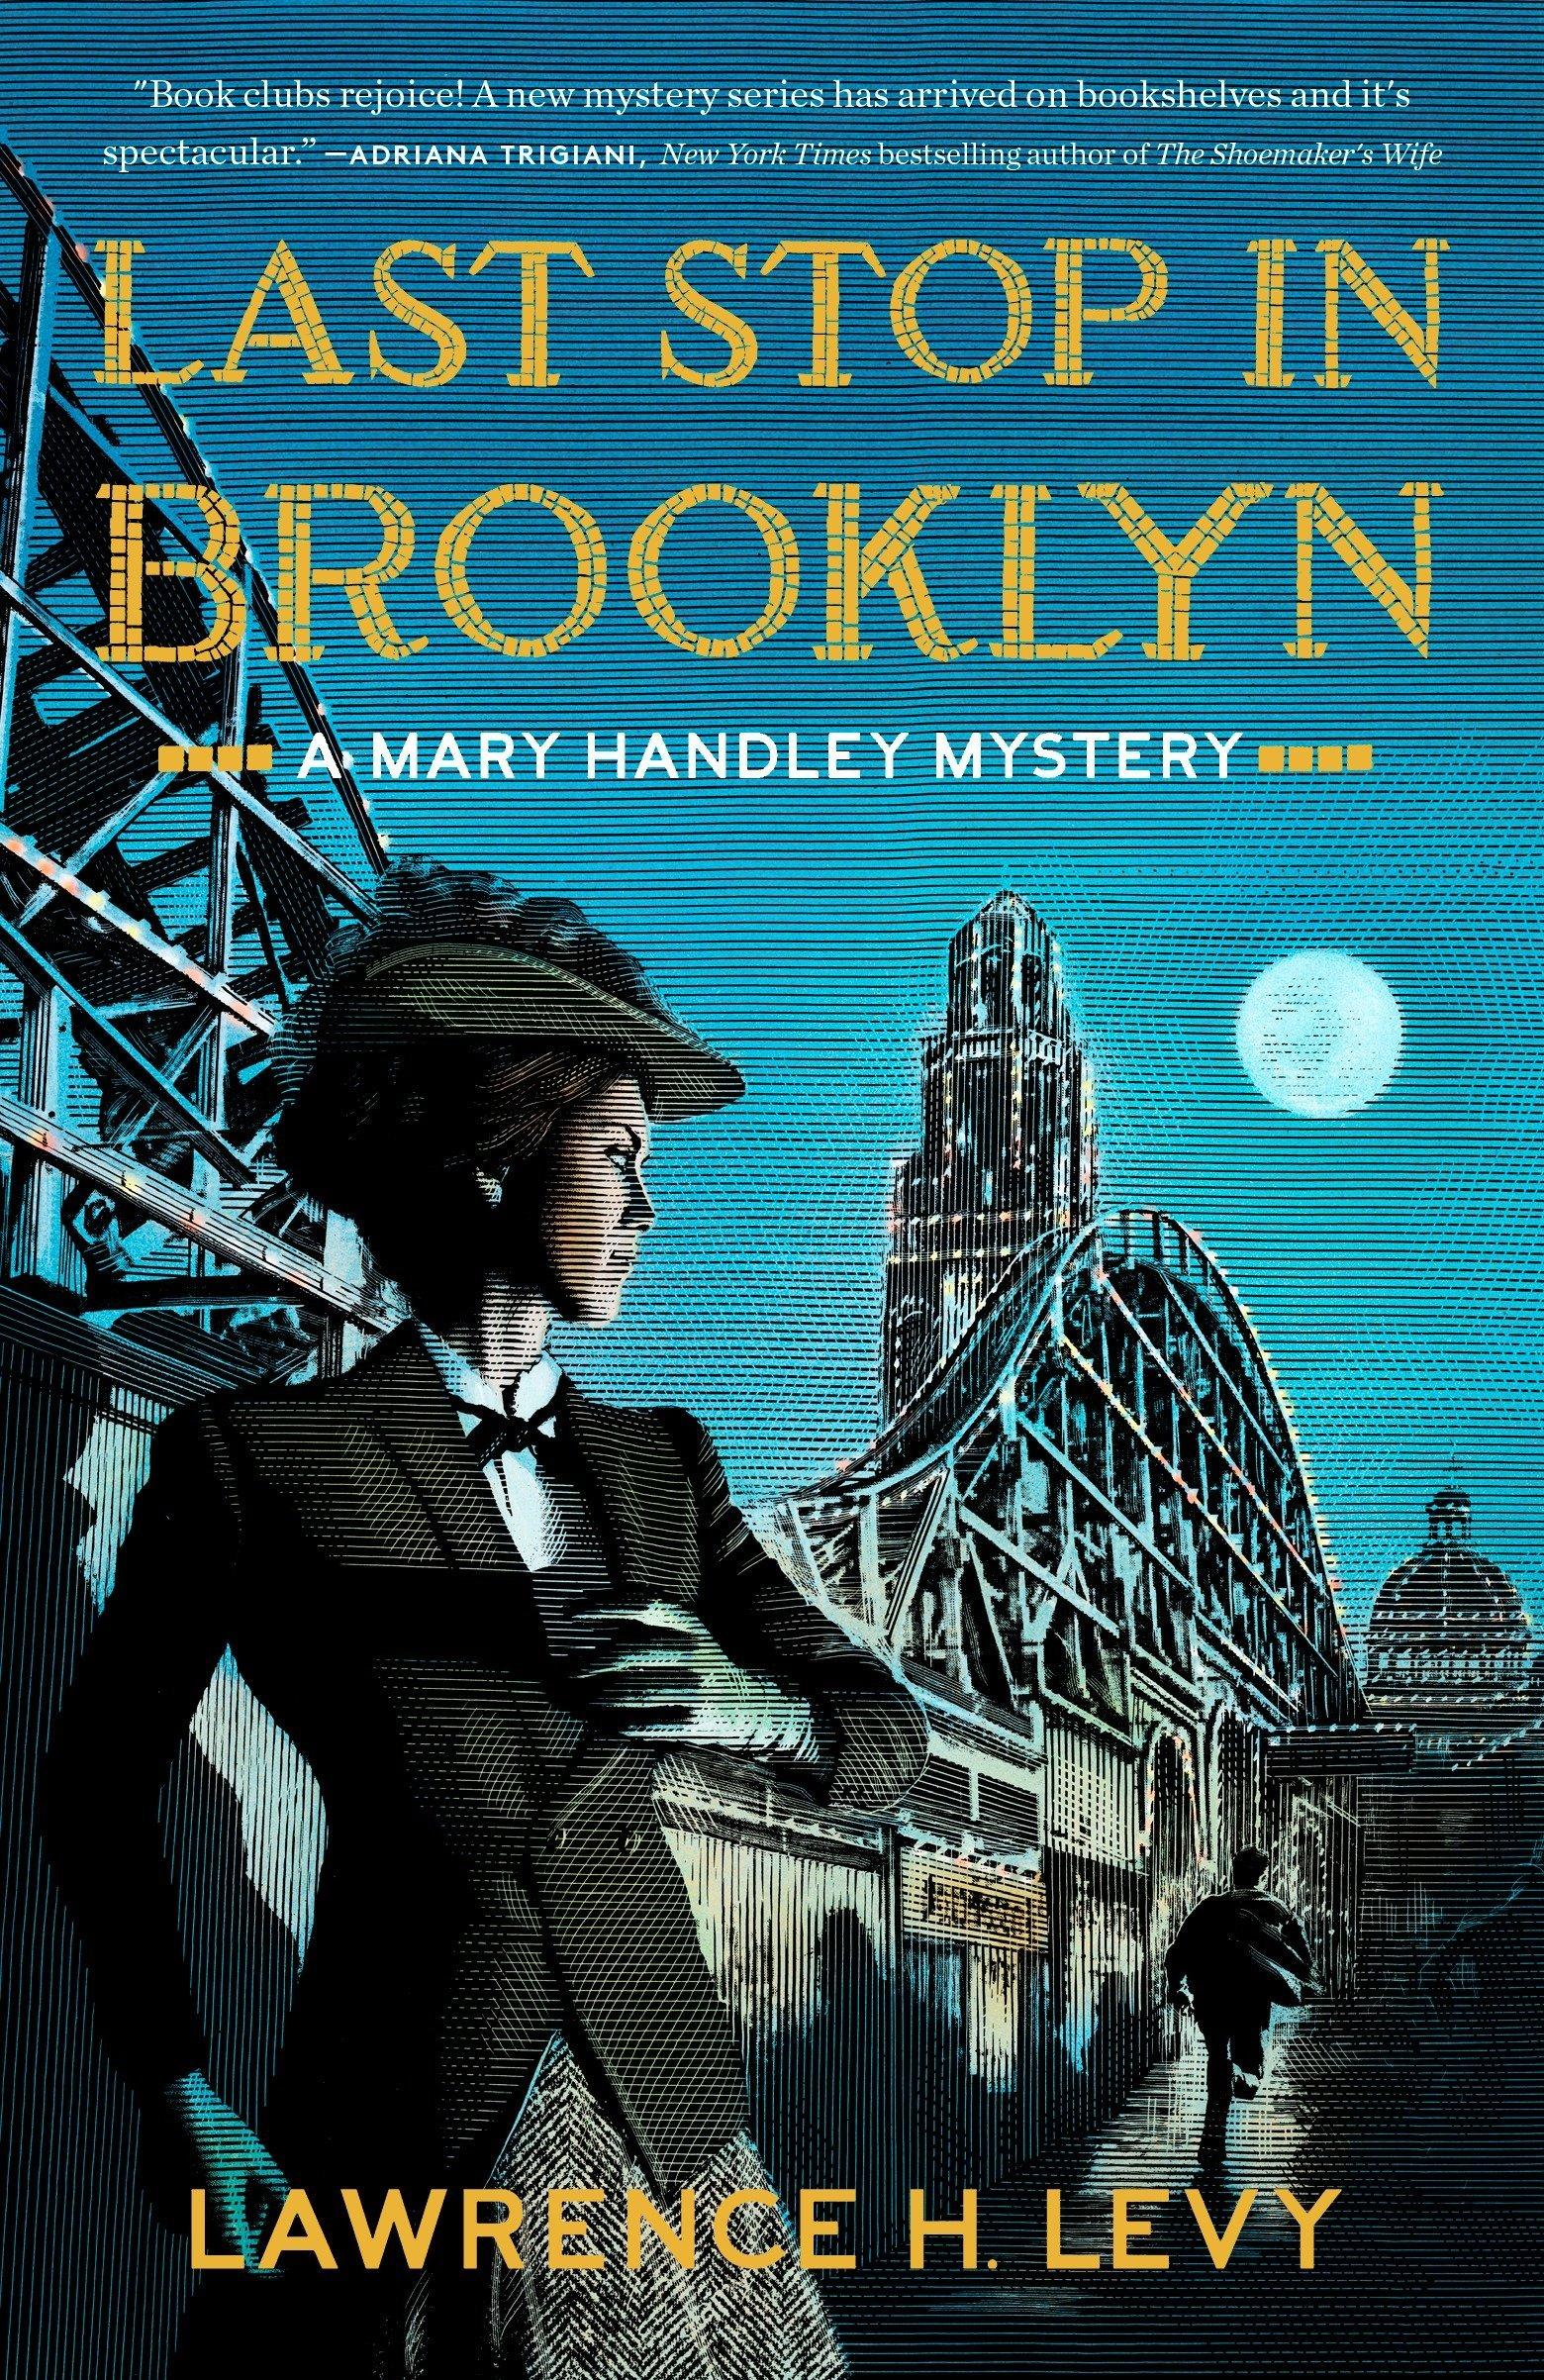 Amazon.com: Last Stop in Brooklyn: A Mary Handley Mystery ...